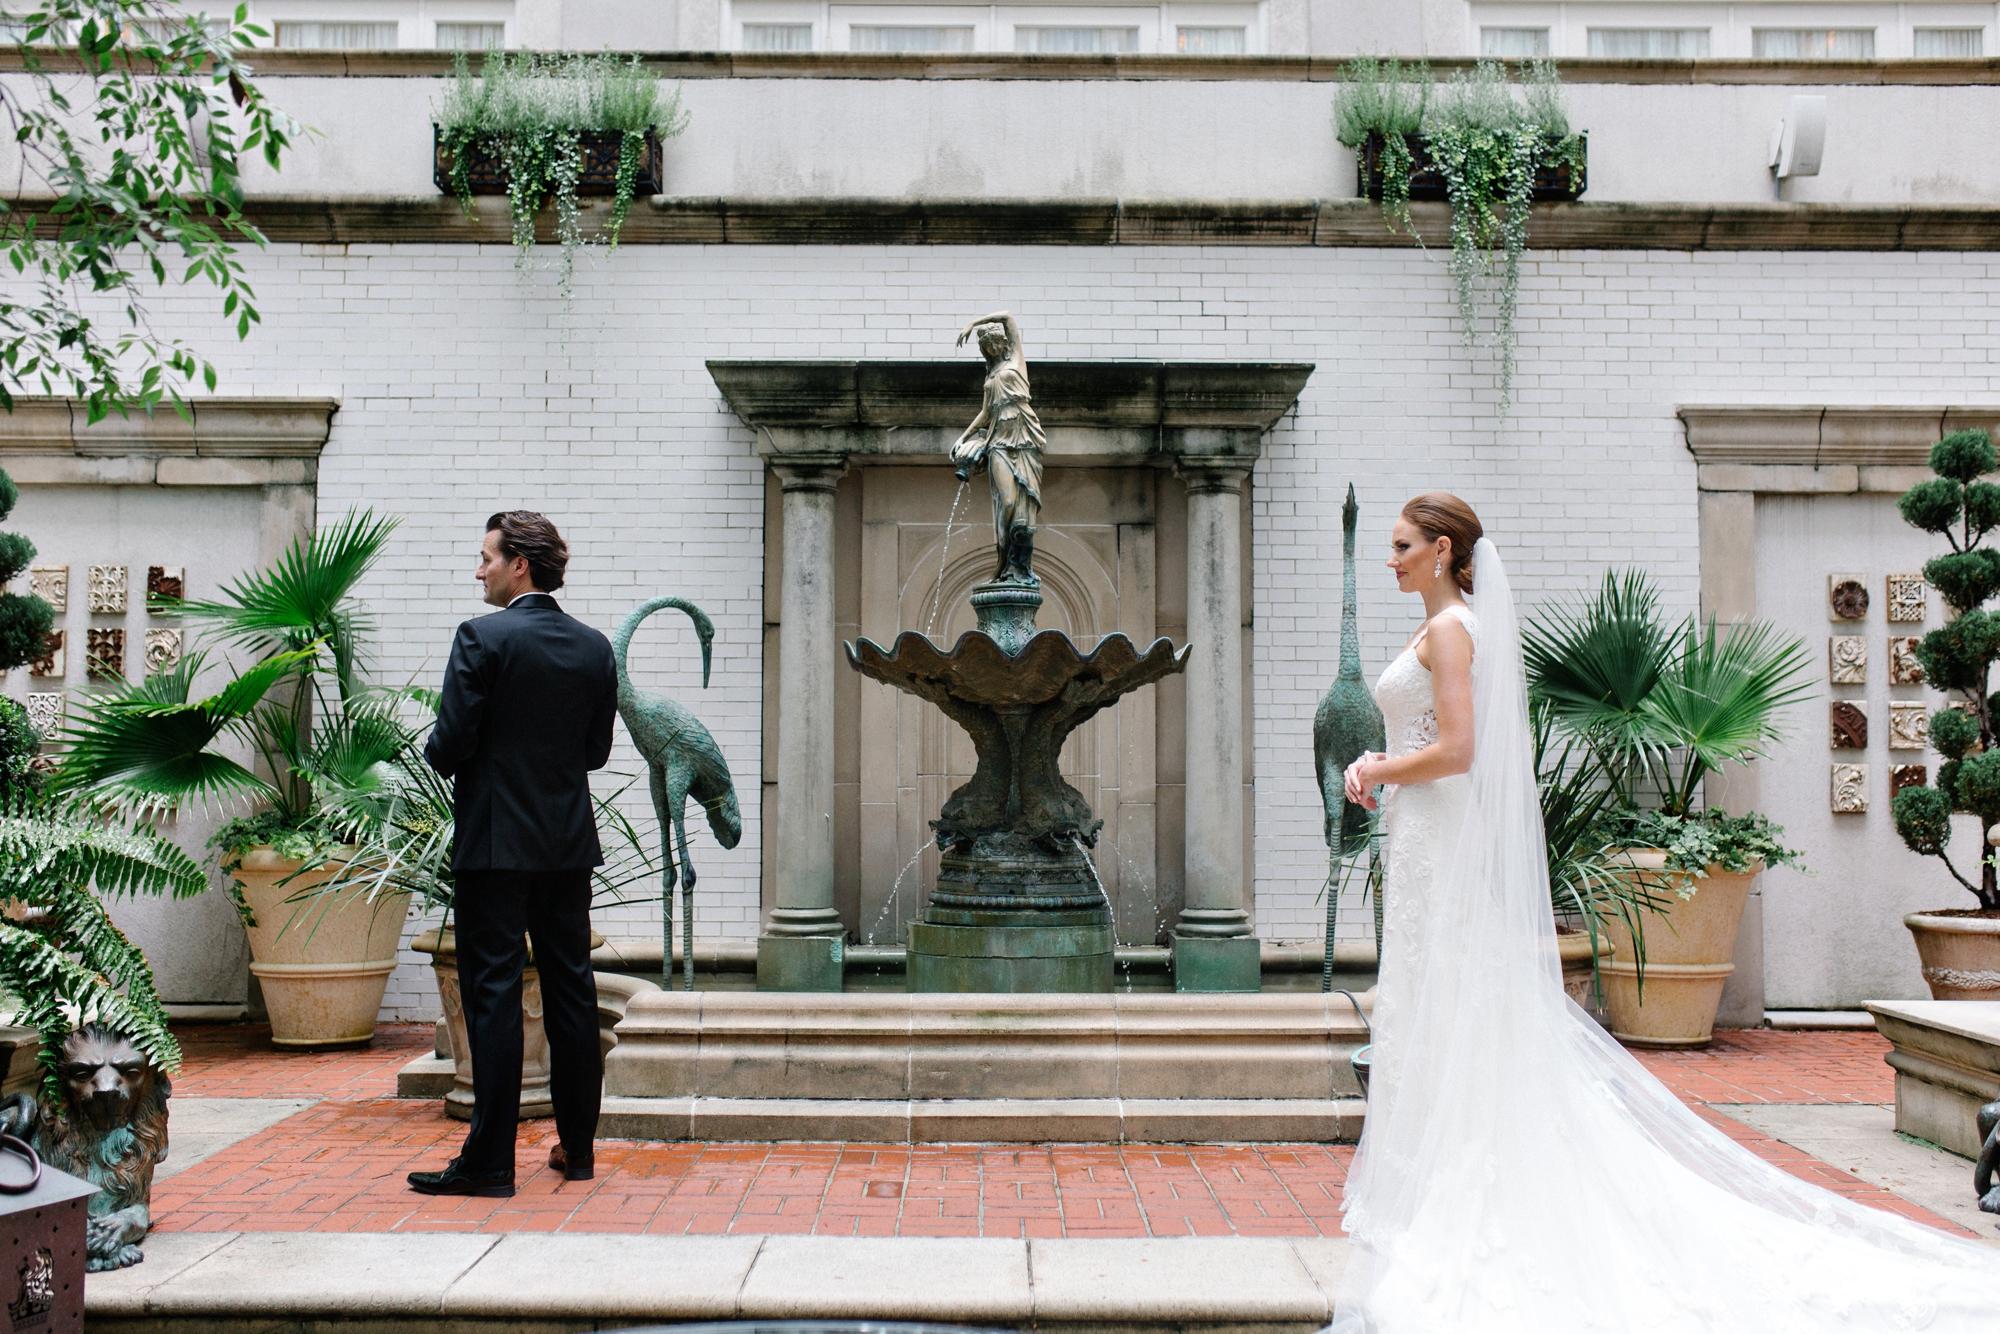 New_Orleans_Wedding_Photographer_1104.jpg